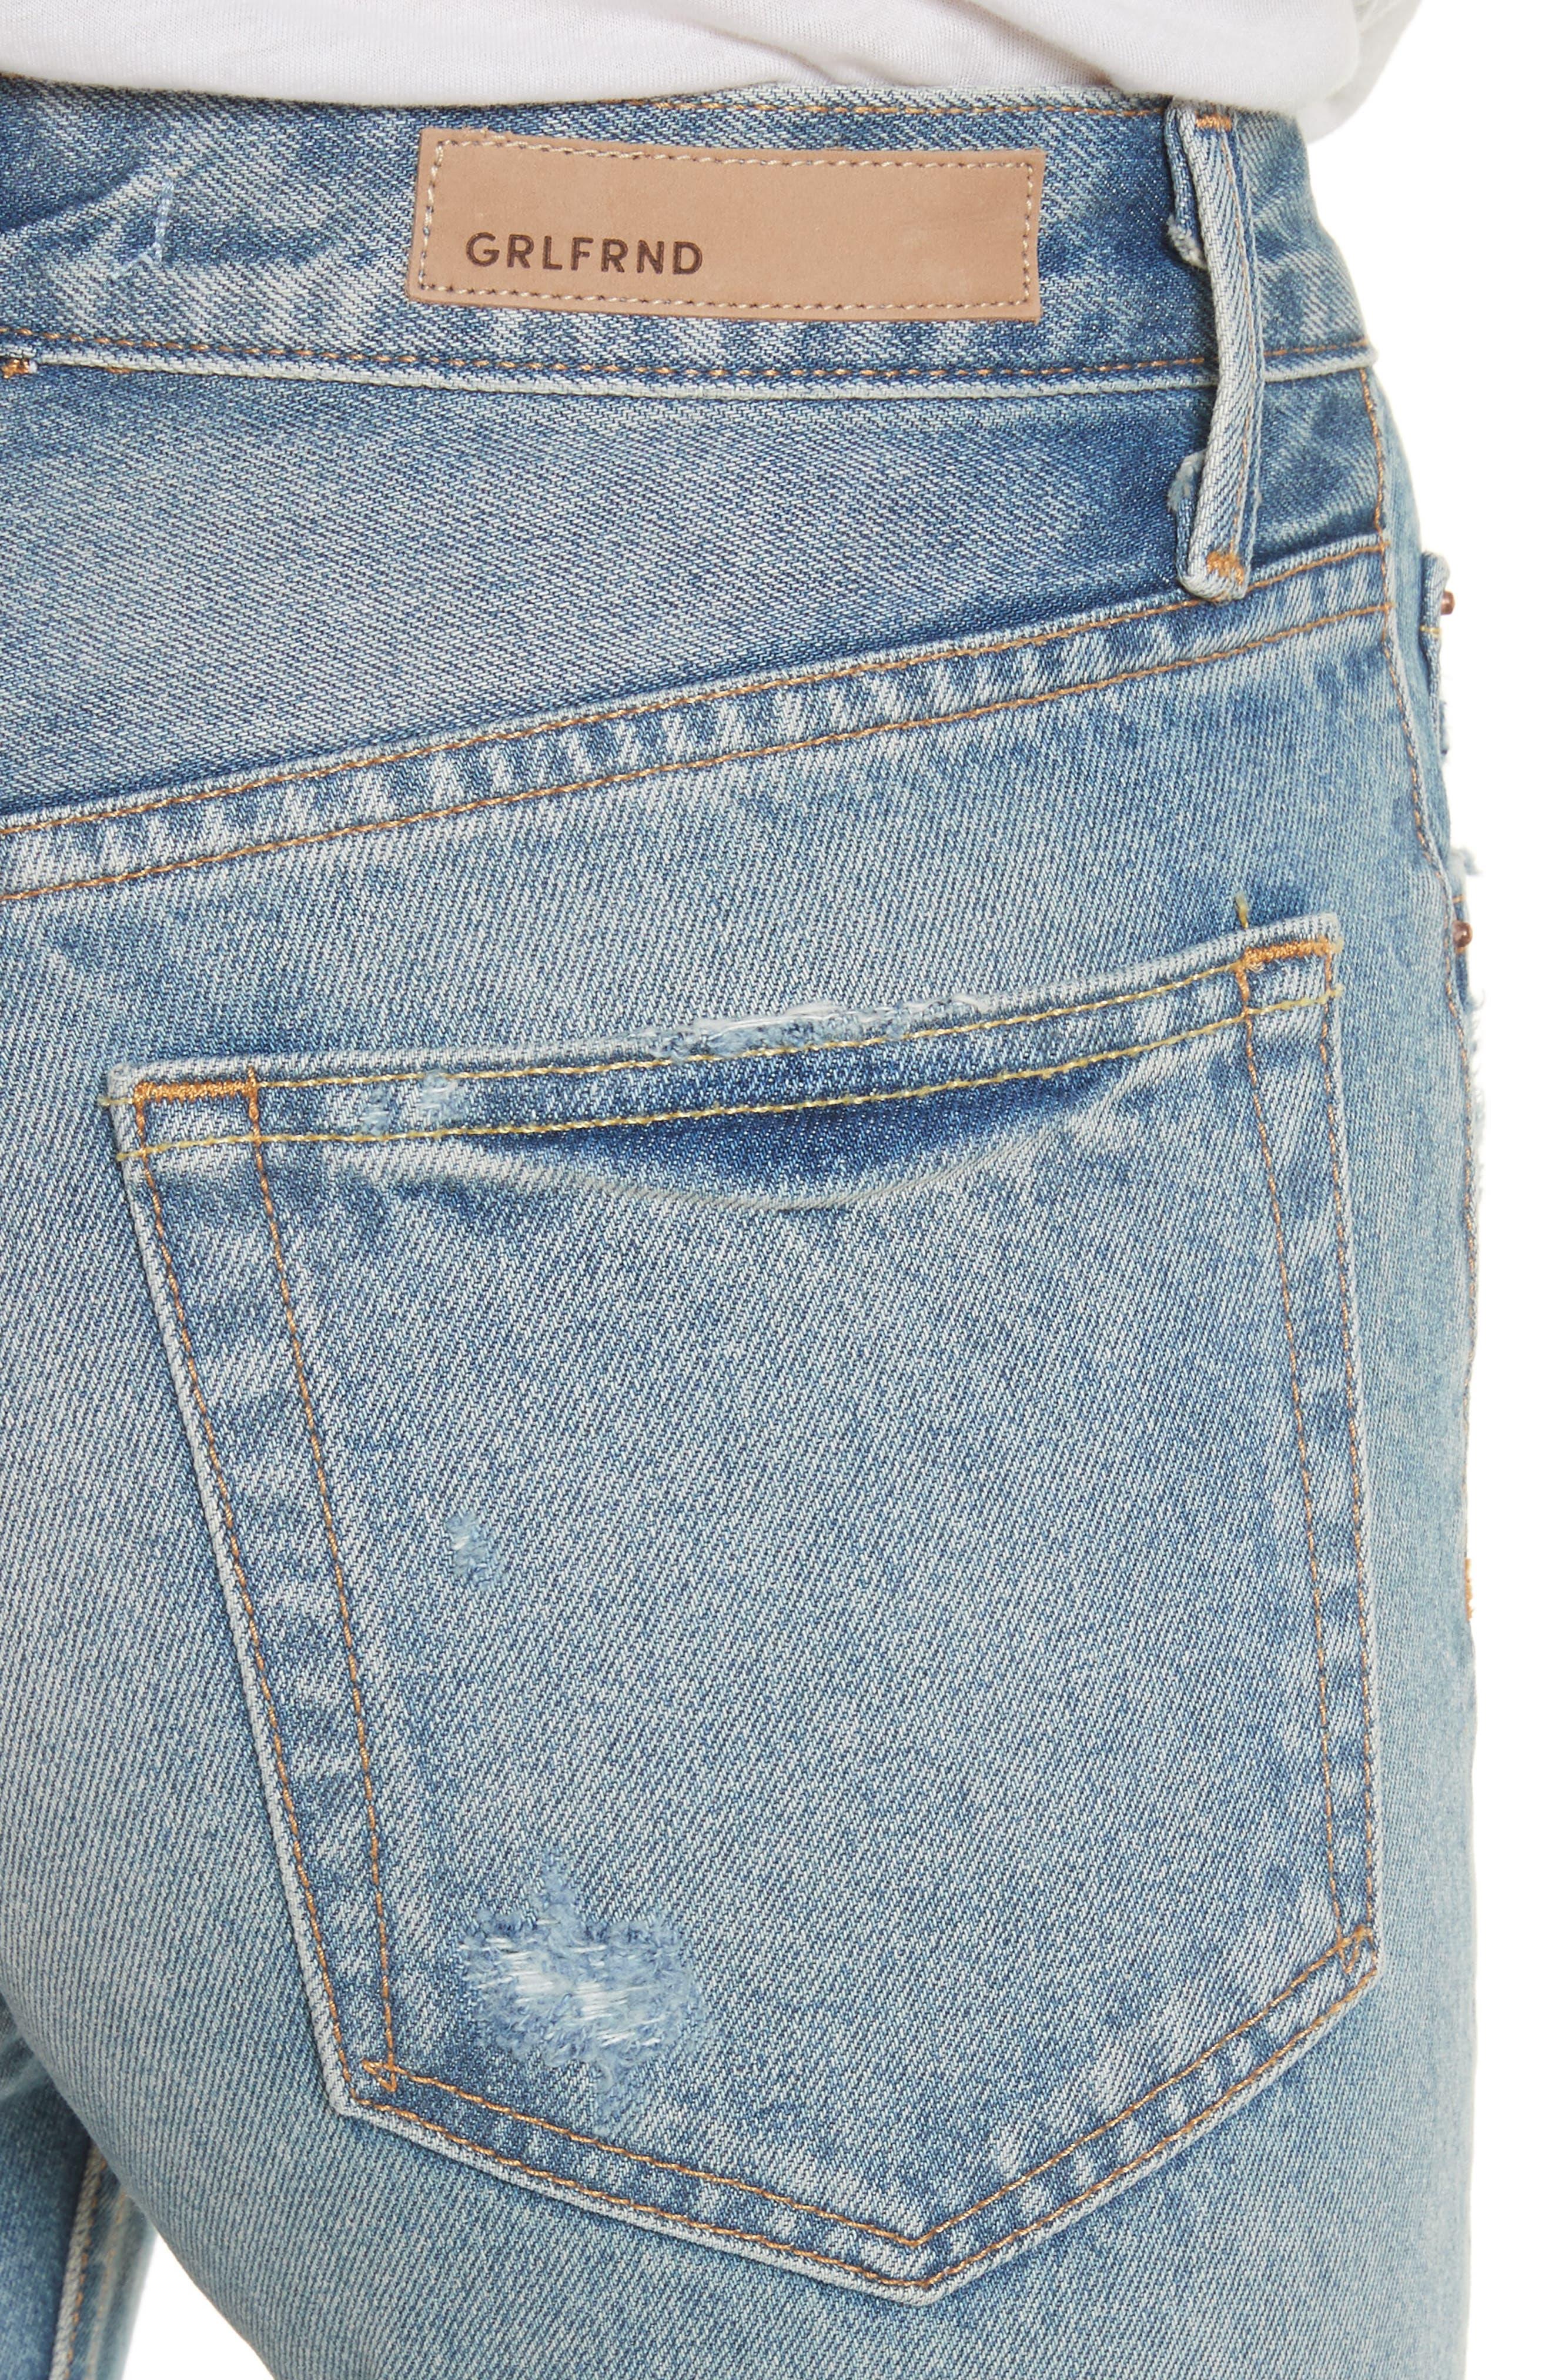 GRLFRND, Karolina Rigid High Waist Skinny Jeans, Alternate thumbnail 5, color, A LITTLE MORE LOVE